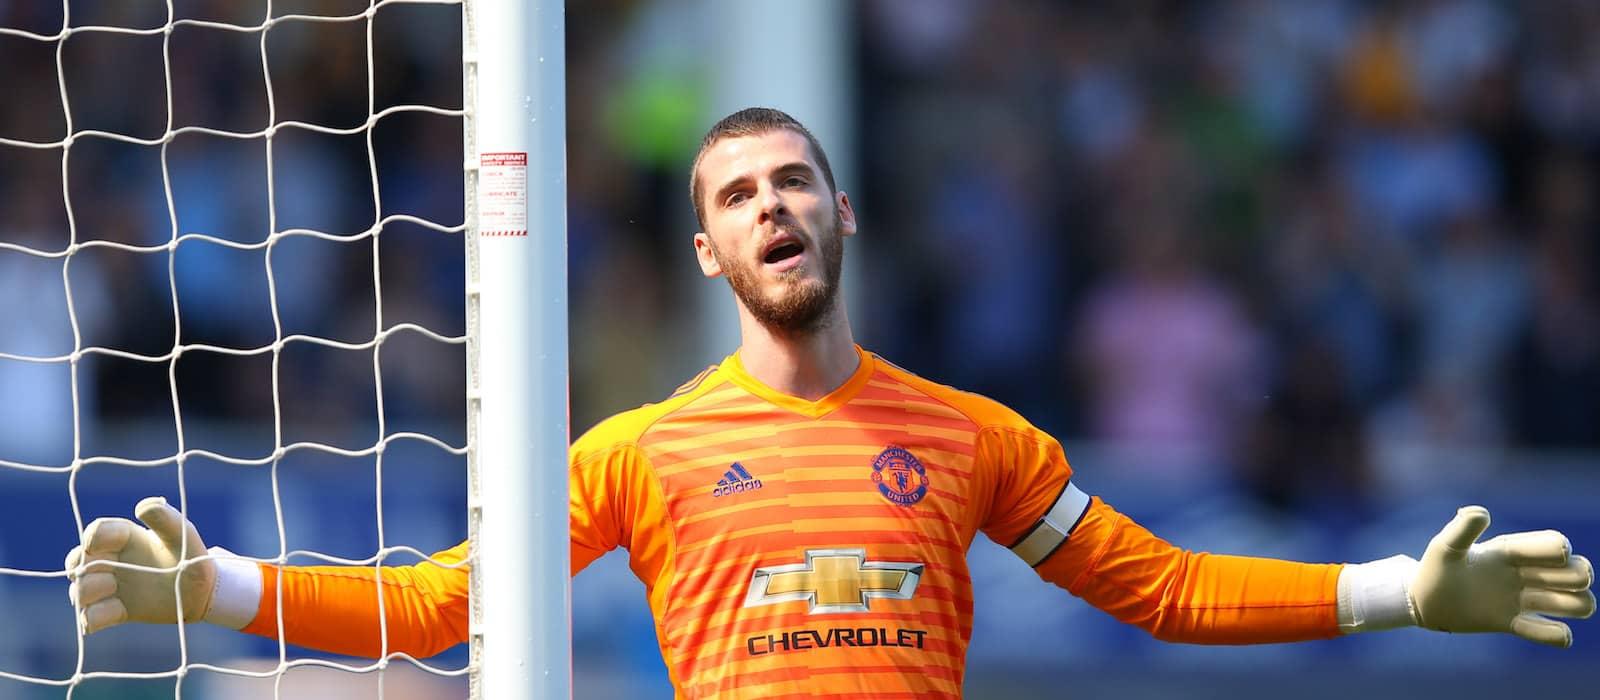 Manchester United fans in despair after David de Gea suffers groin injury